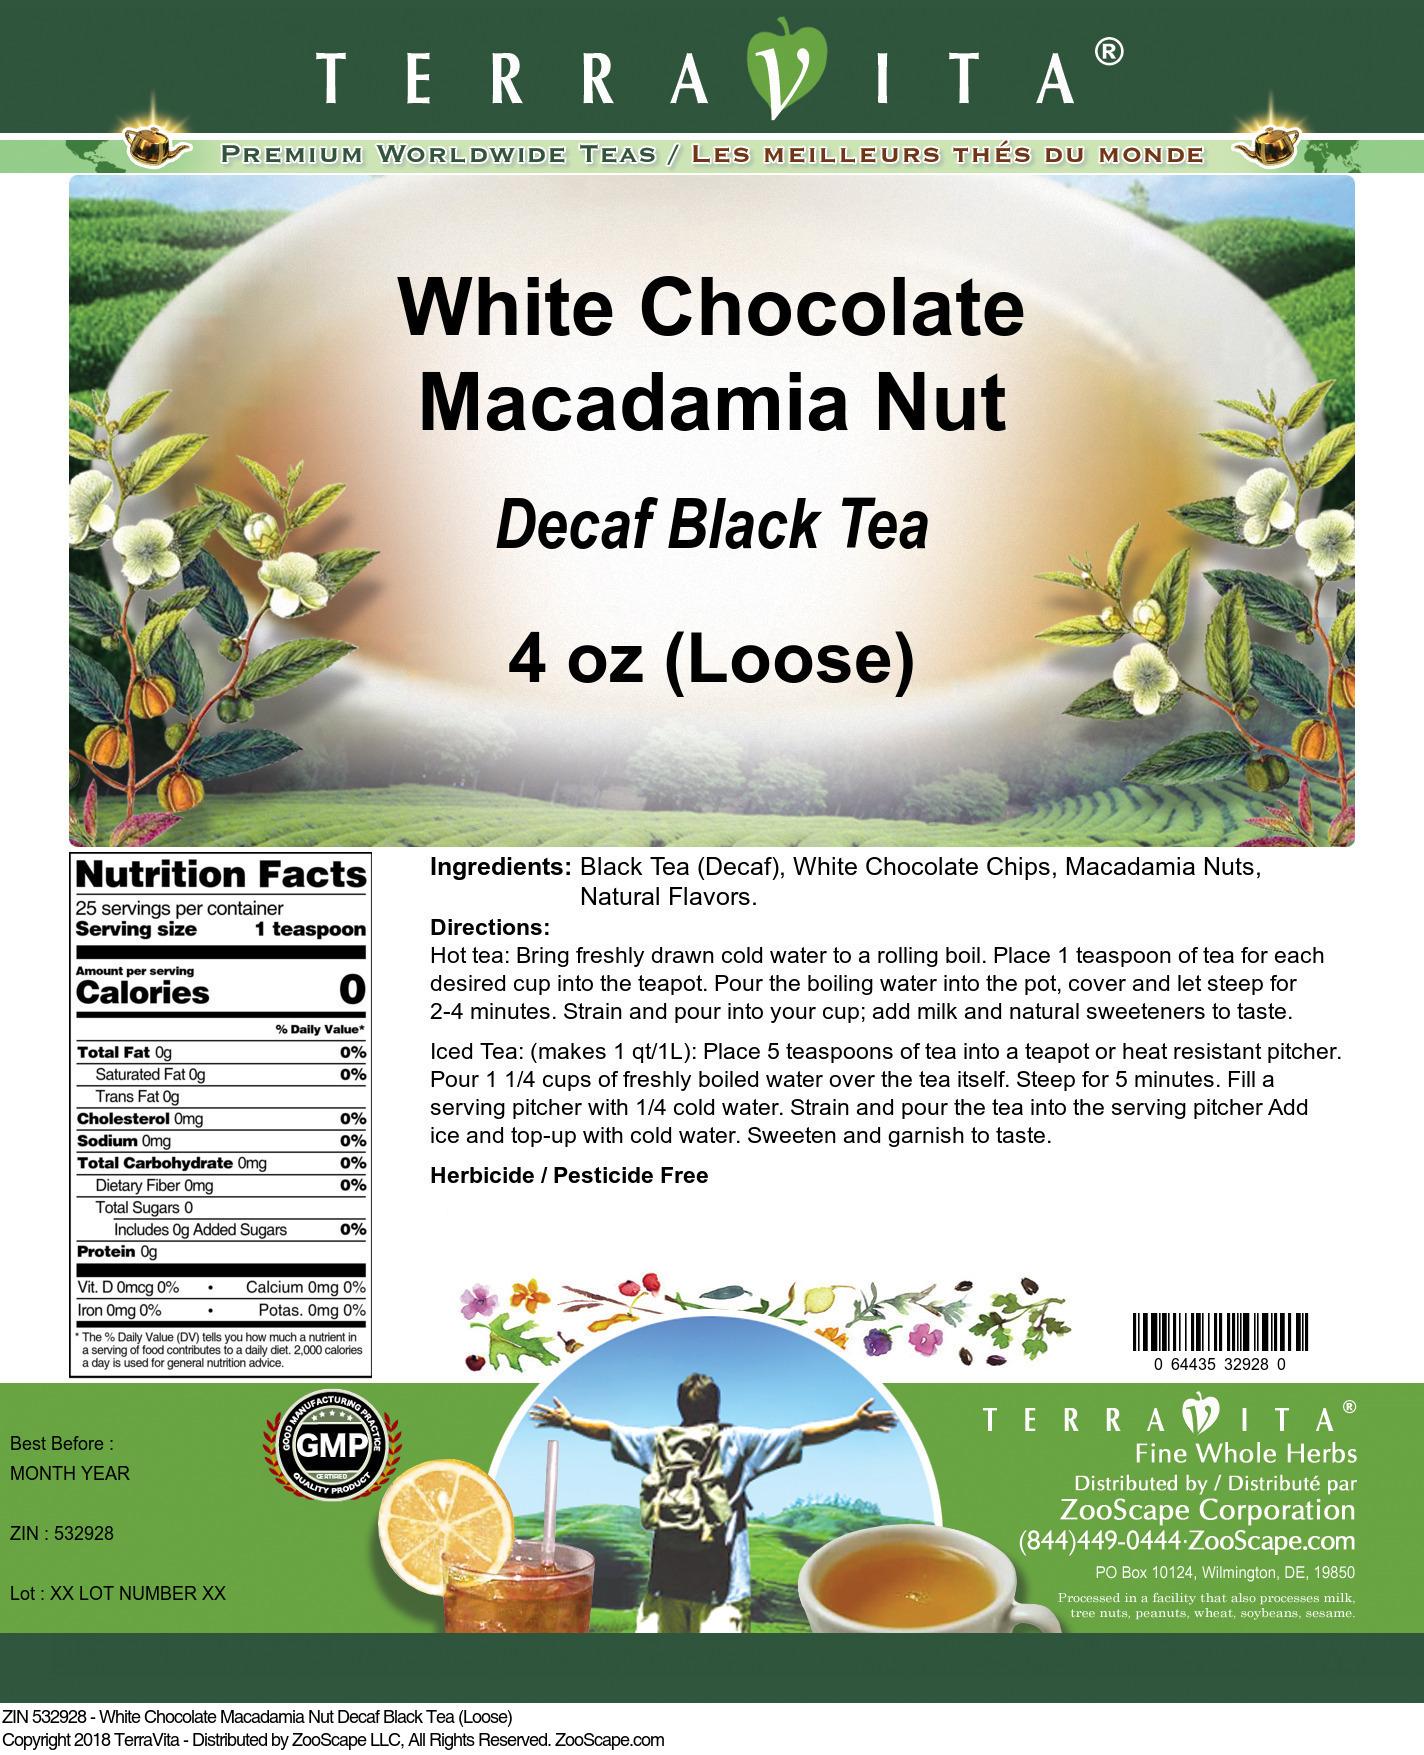 White Chocolate Macadamia Nut Decaf Black Tea